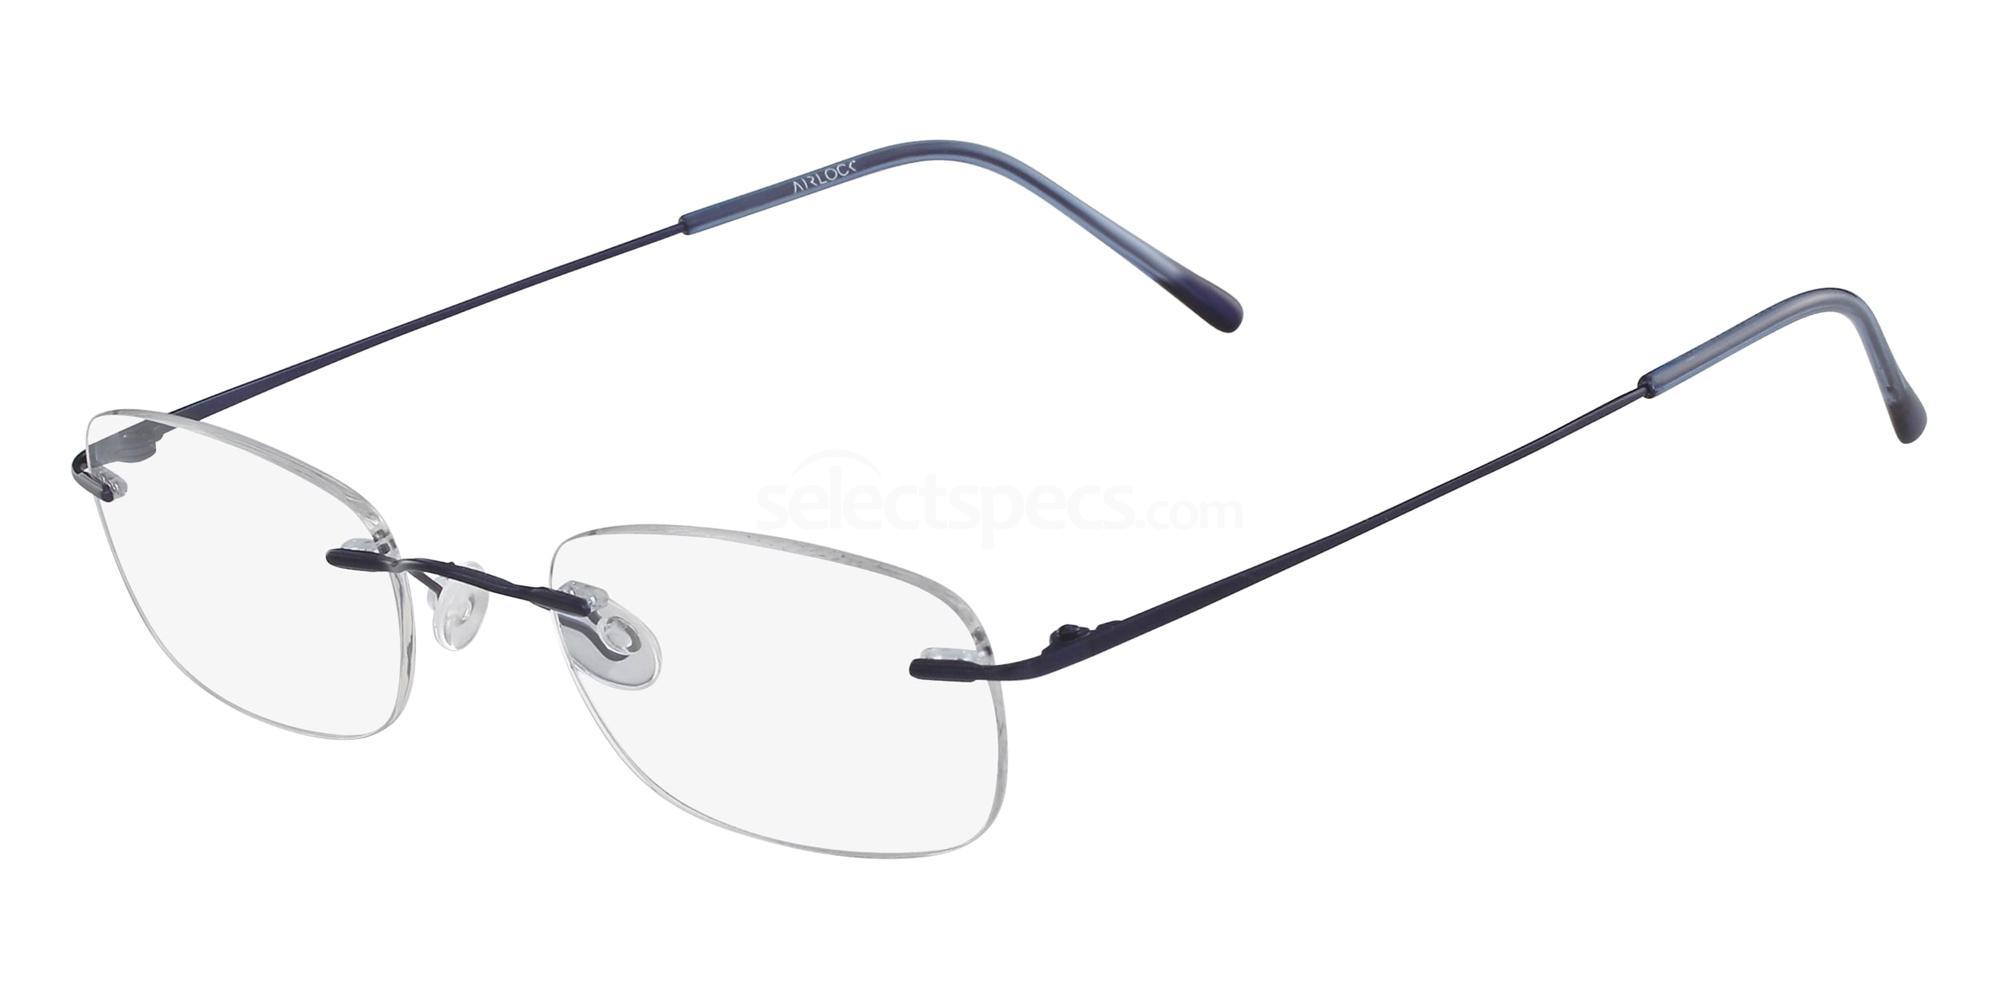 412 SEVEN-SIXTY 203 Glasses, AIRLOCK